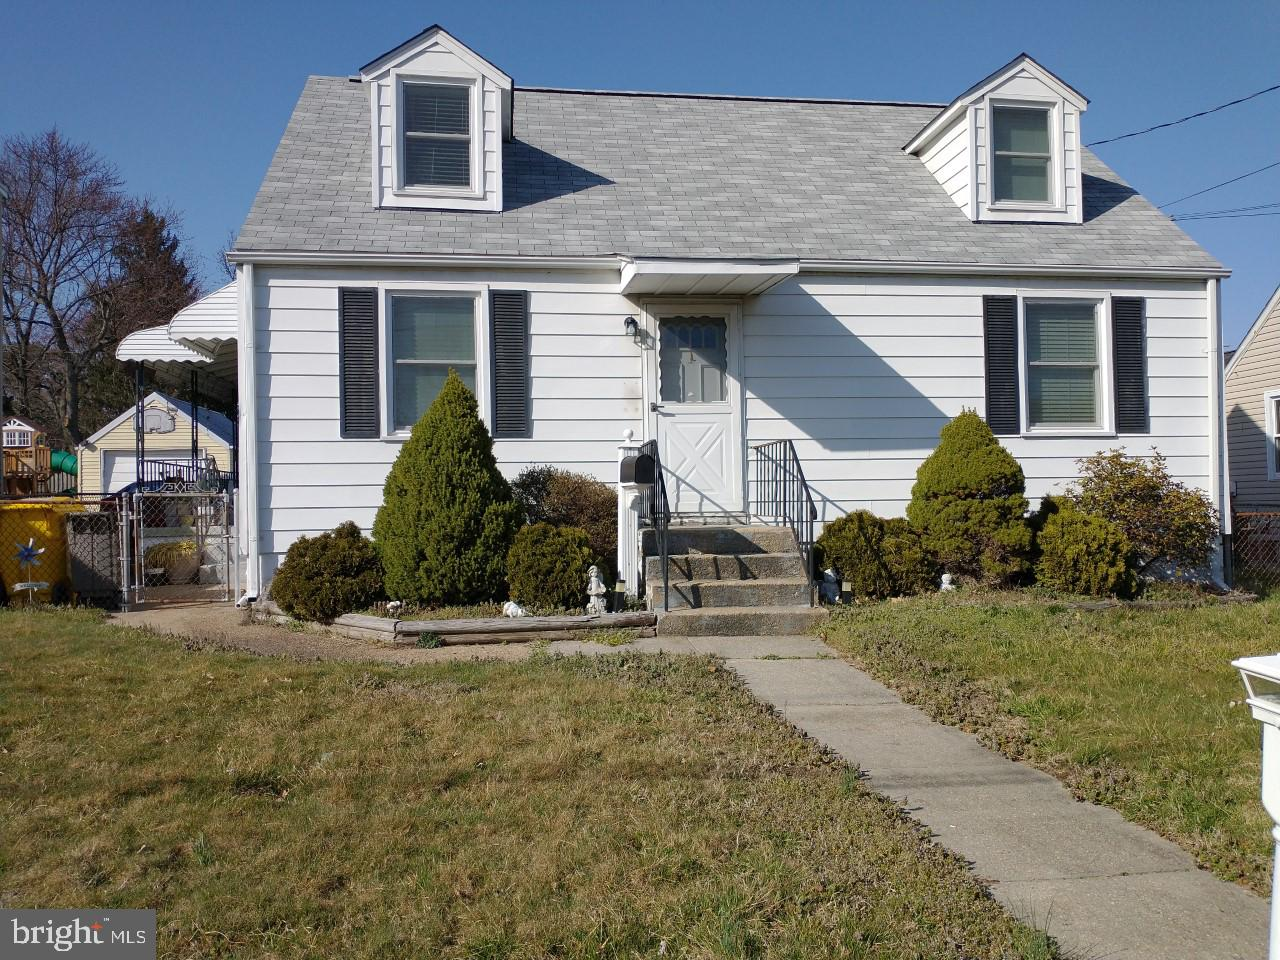 302 MILTON AVE, GLEN BURNIE, Maryland 21061, 4 Bedrooms Bedrooms, ,1 BathroomBathrooms,Single Family,For Sale,302 MILTON AVE,MDAA463104